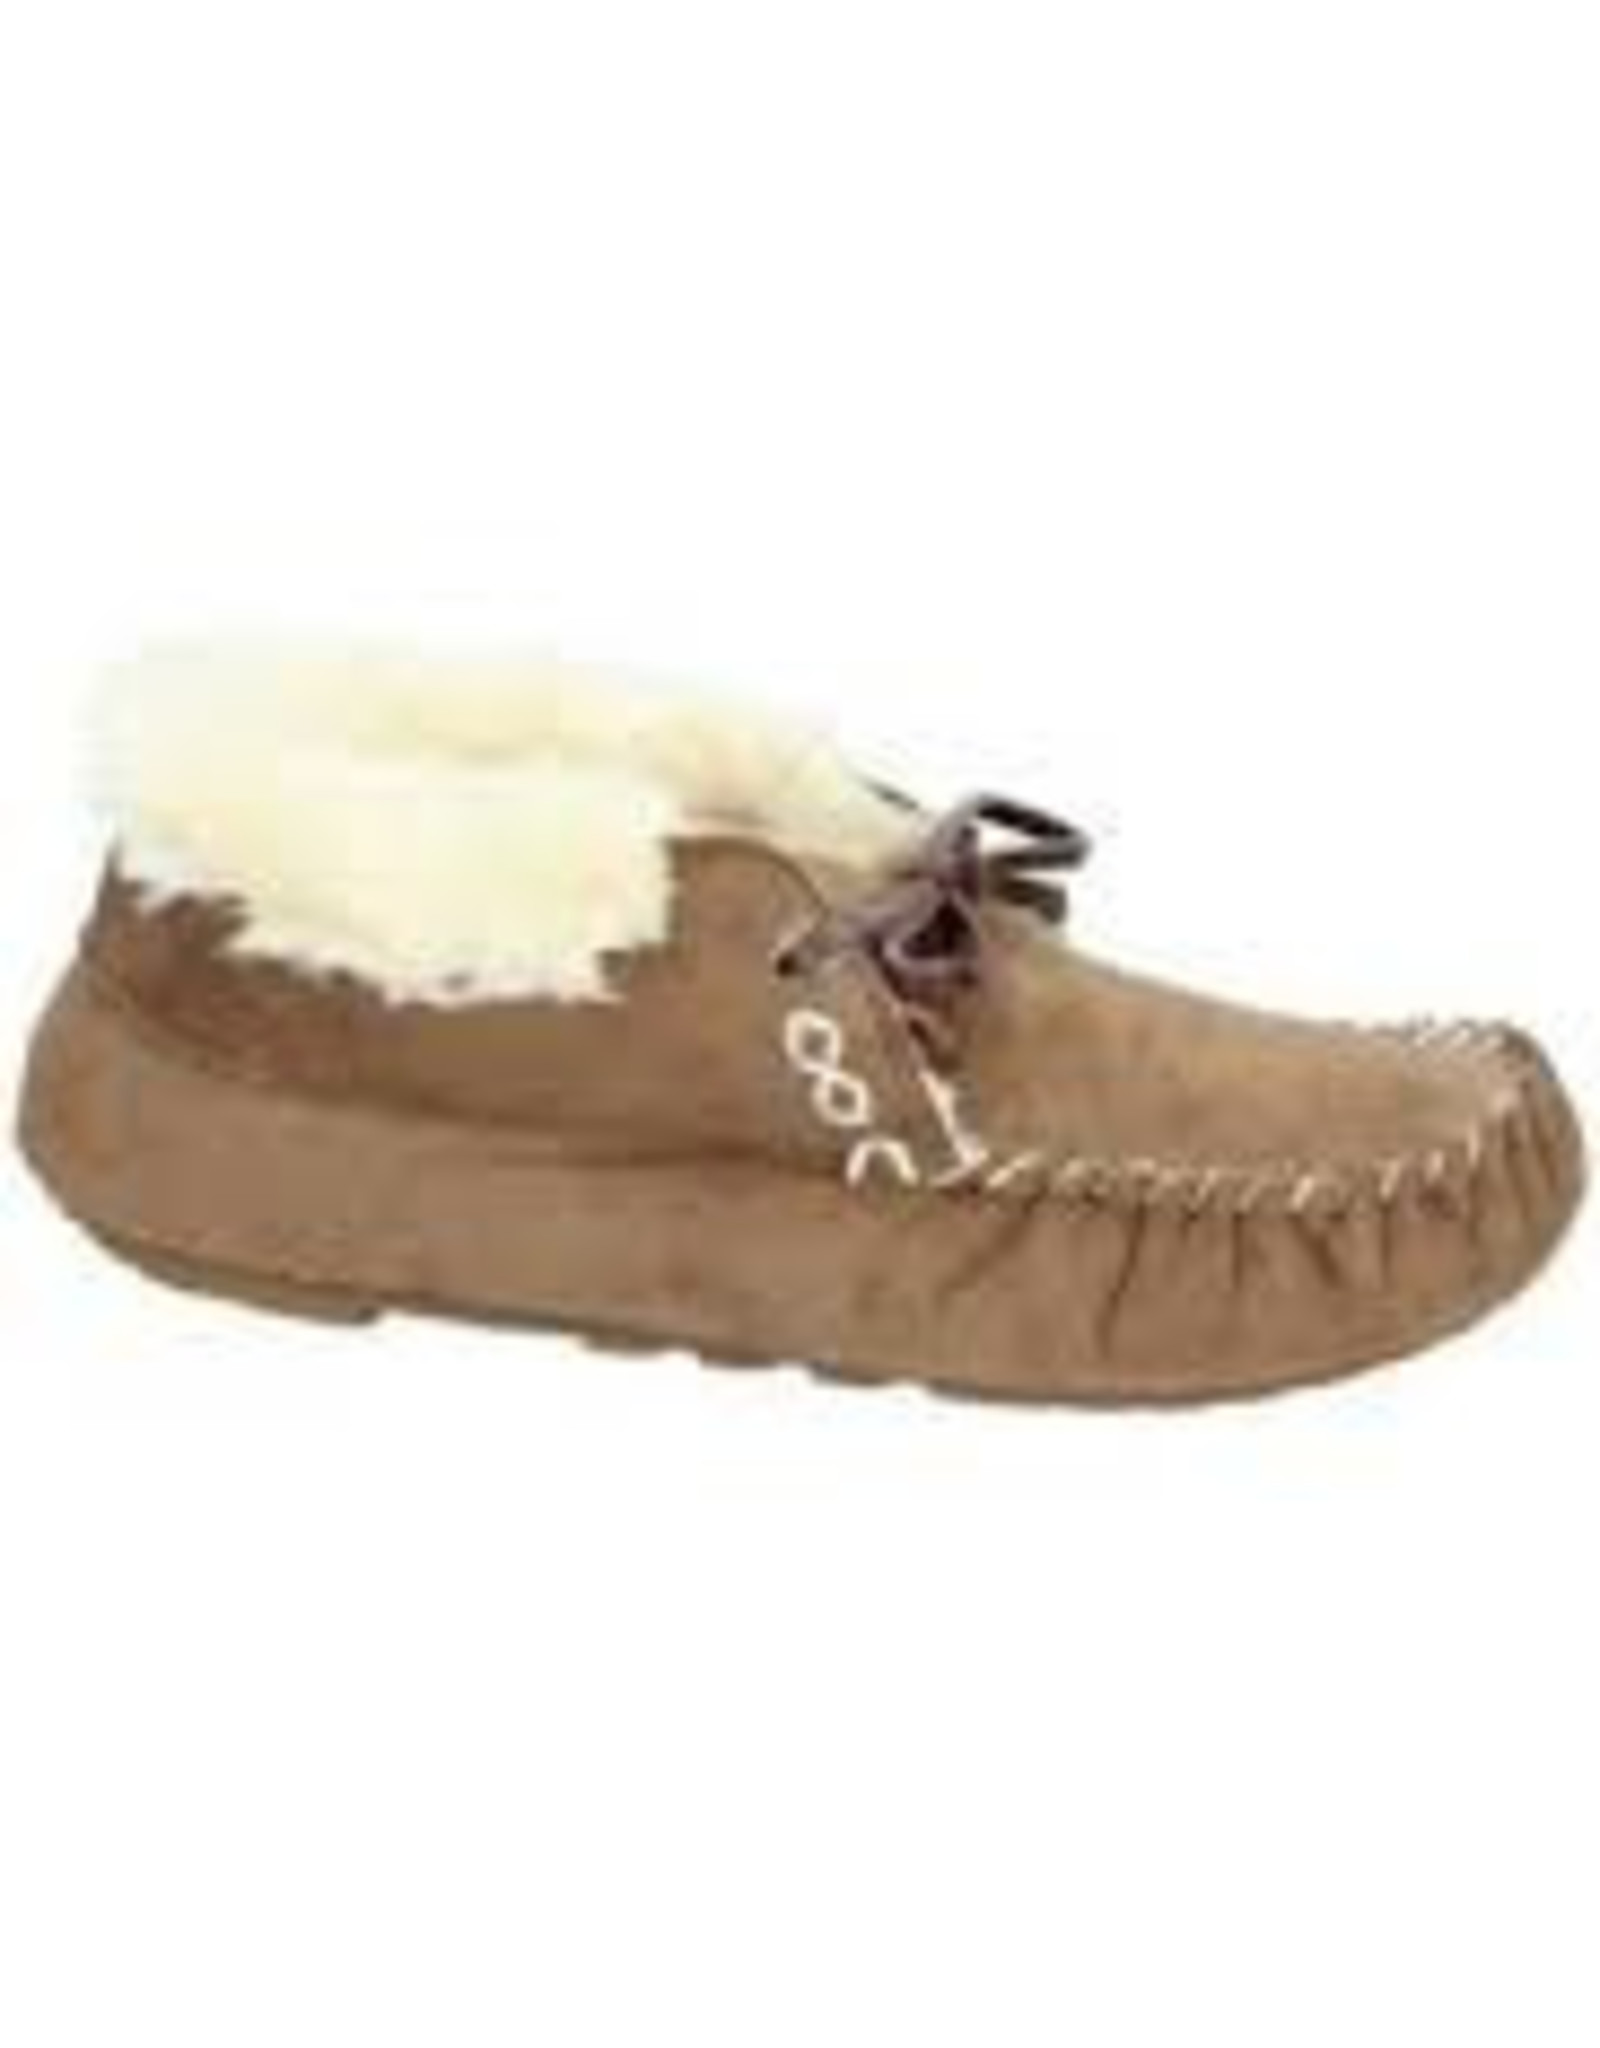 Ruby Brown Mocassin bootie 8887 camel -/-30%